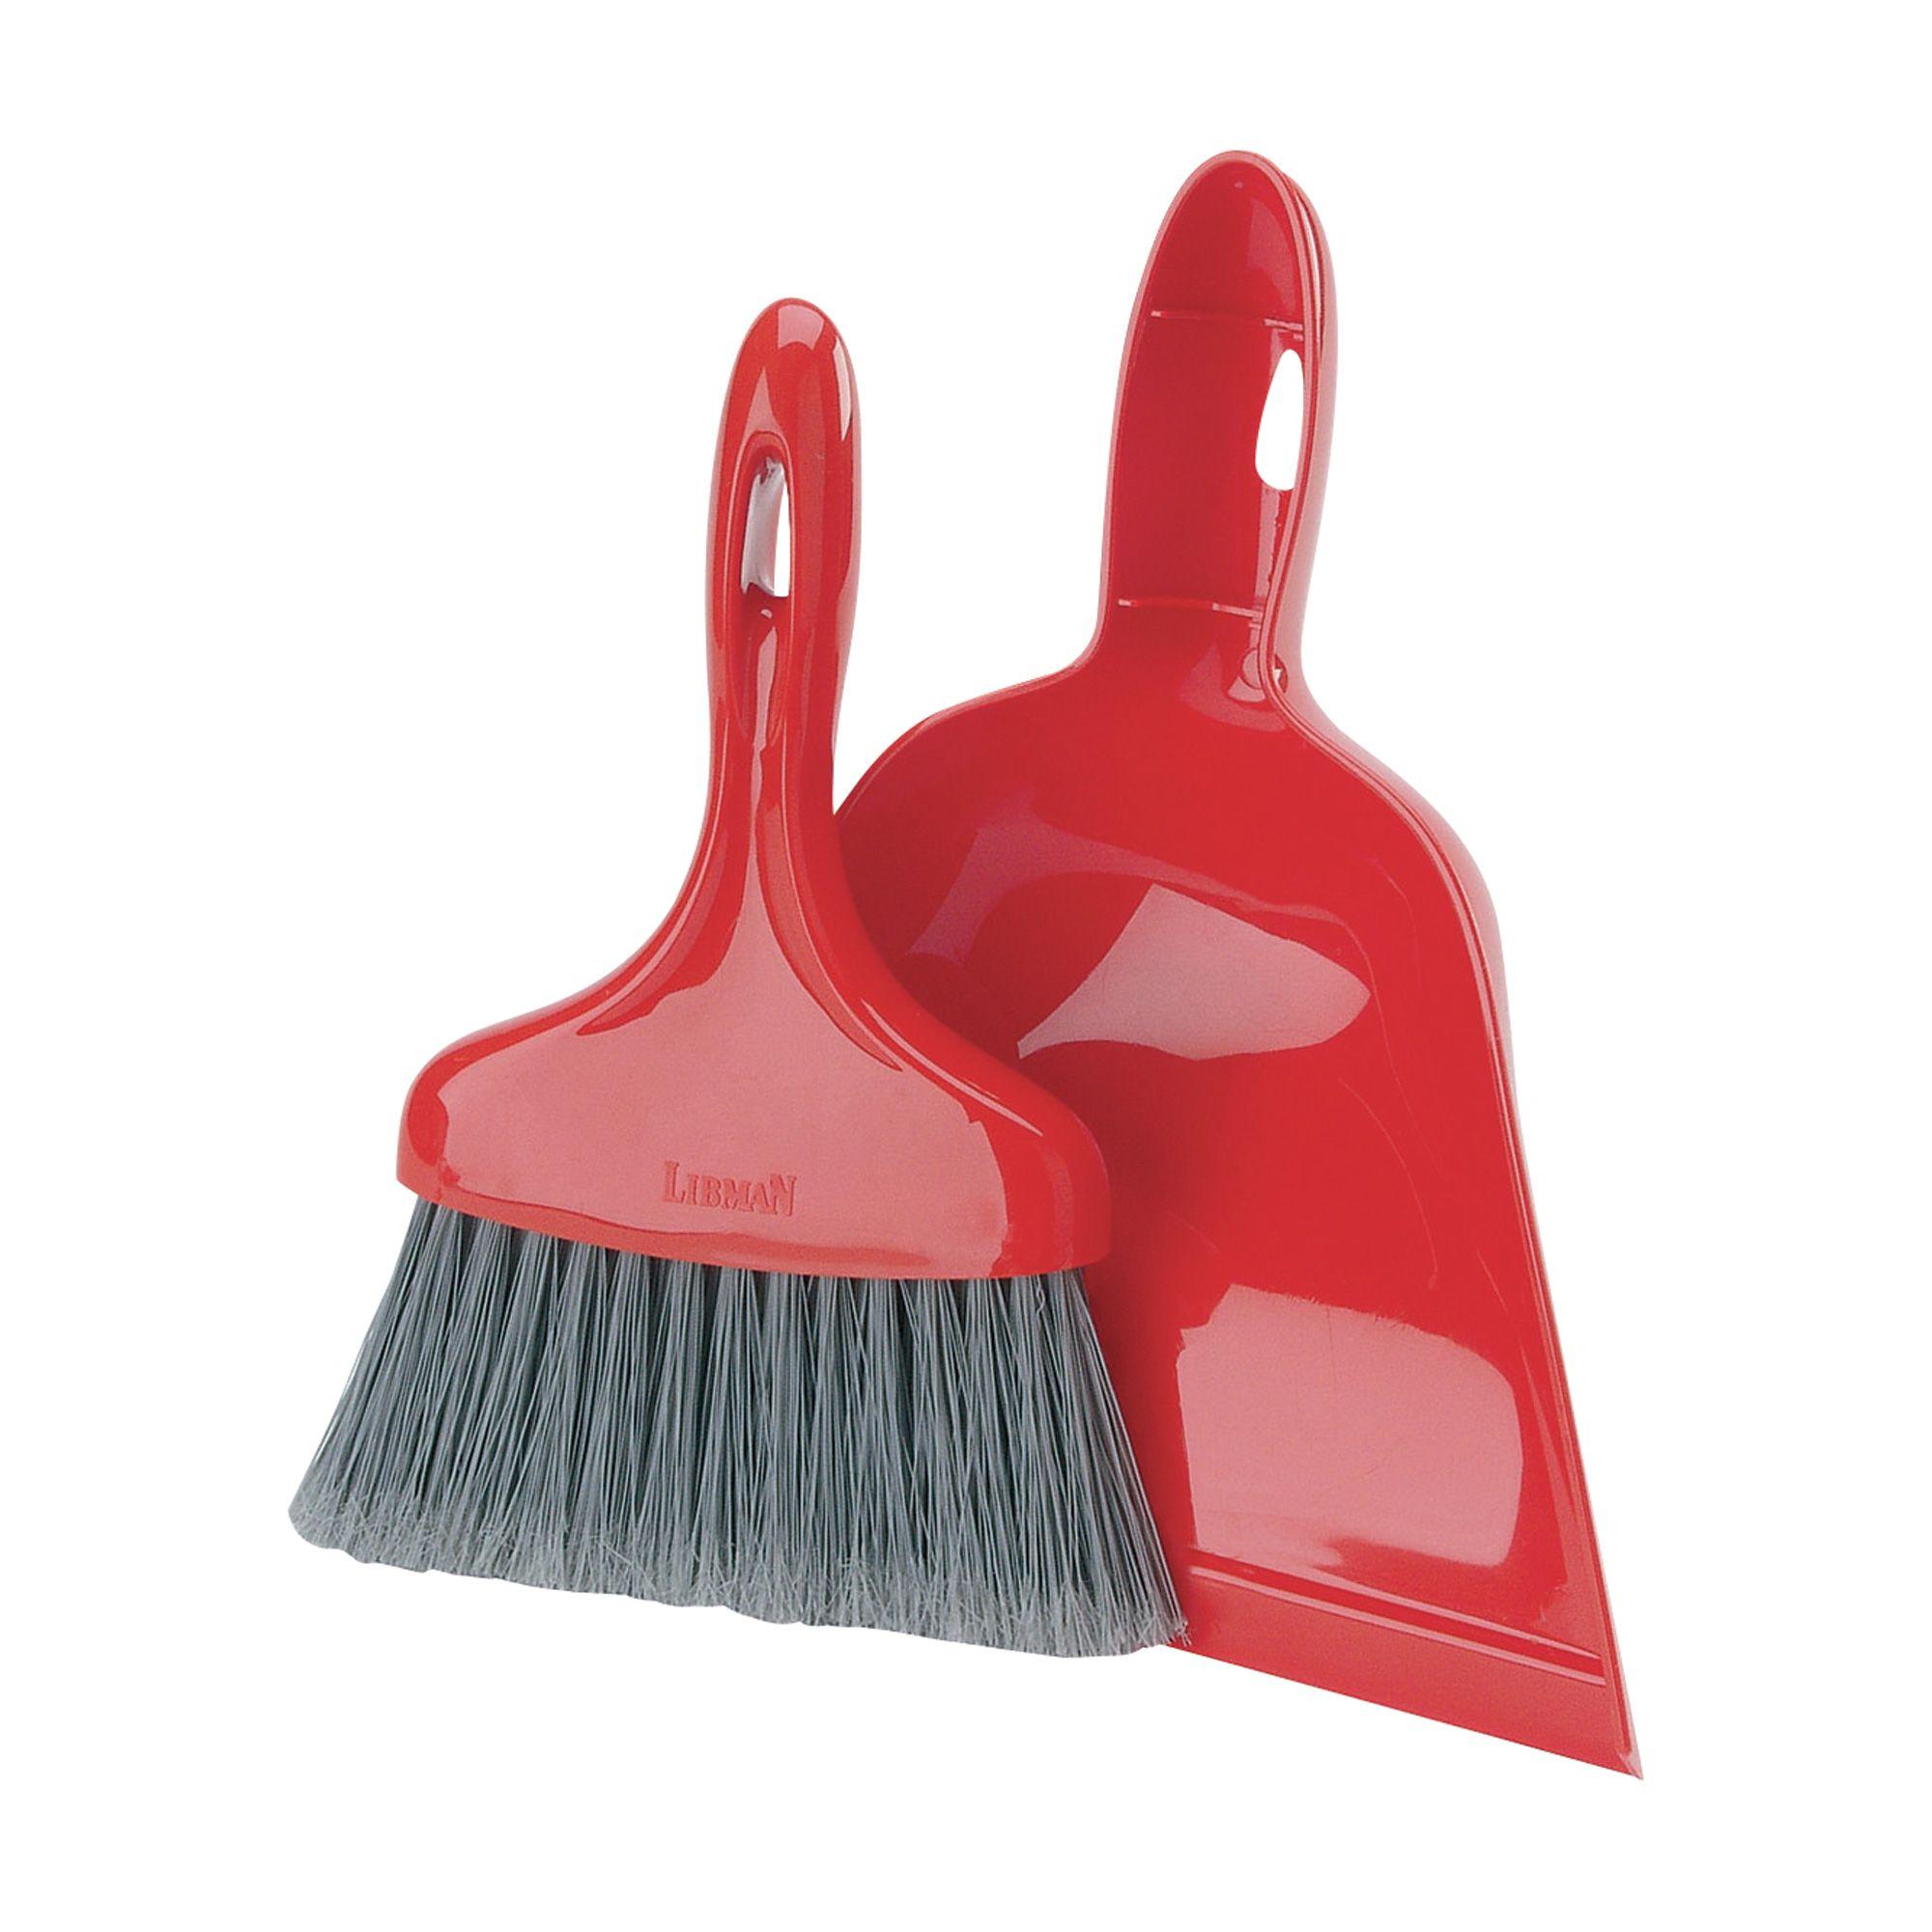 Broom clipart dustpan. Hand camping pinterest